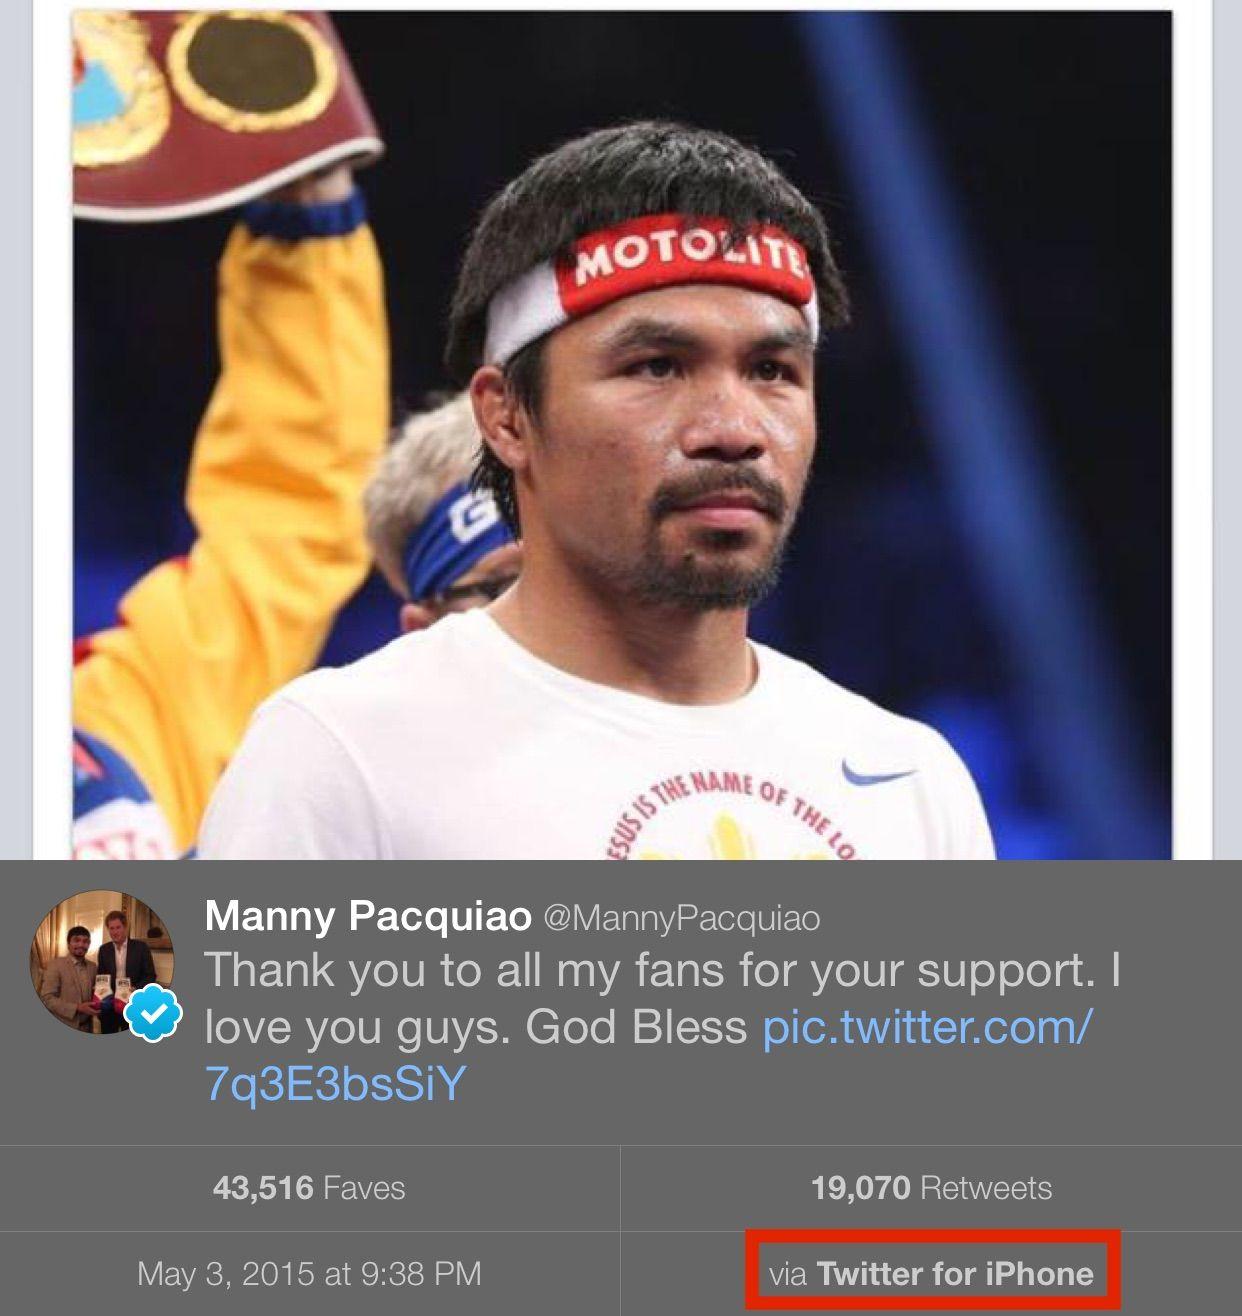 Manny Pacquiao Samsung Galaxy S6 1 - iDevice.ro